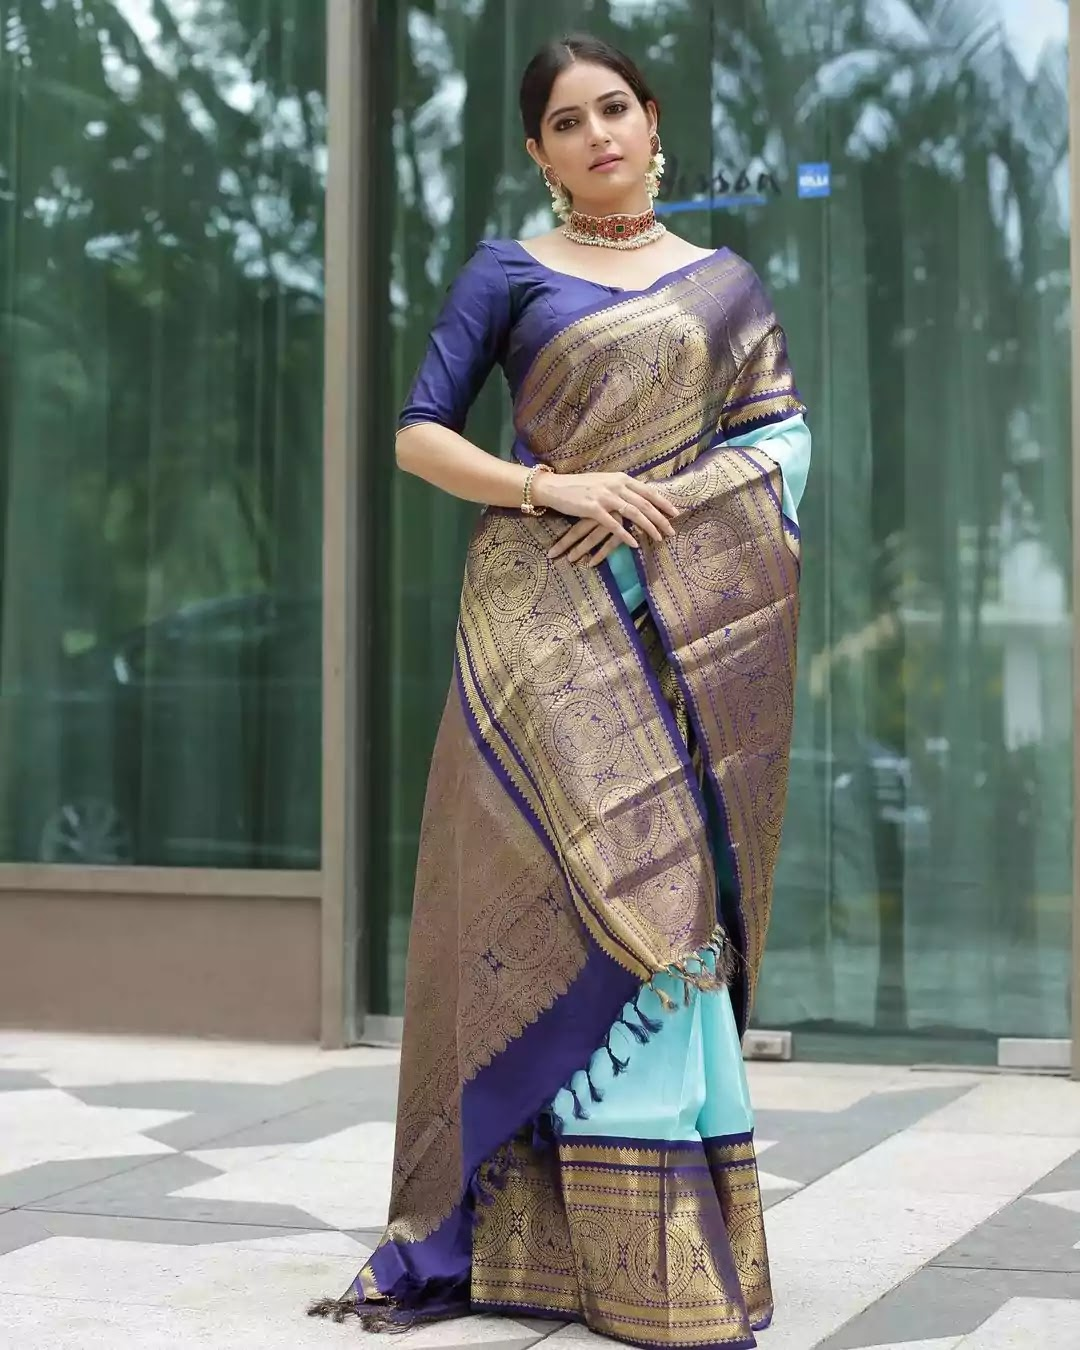 ashika-ranganath-in-blue-kanjeevaram-saree